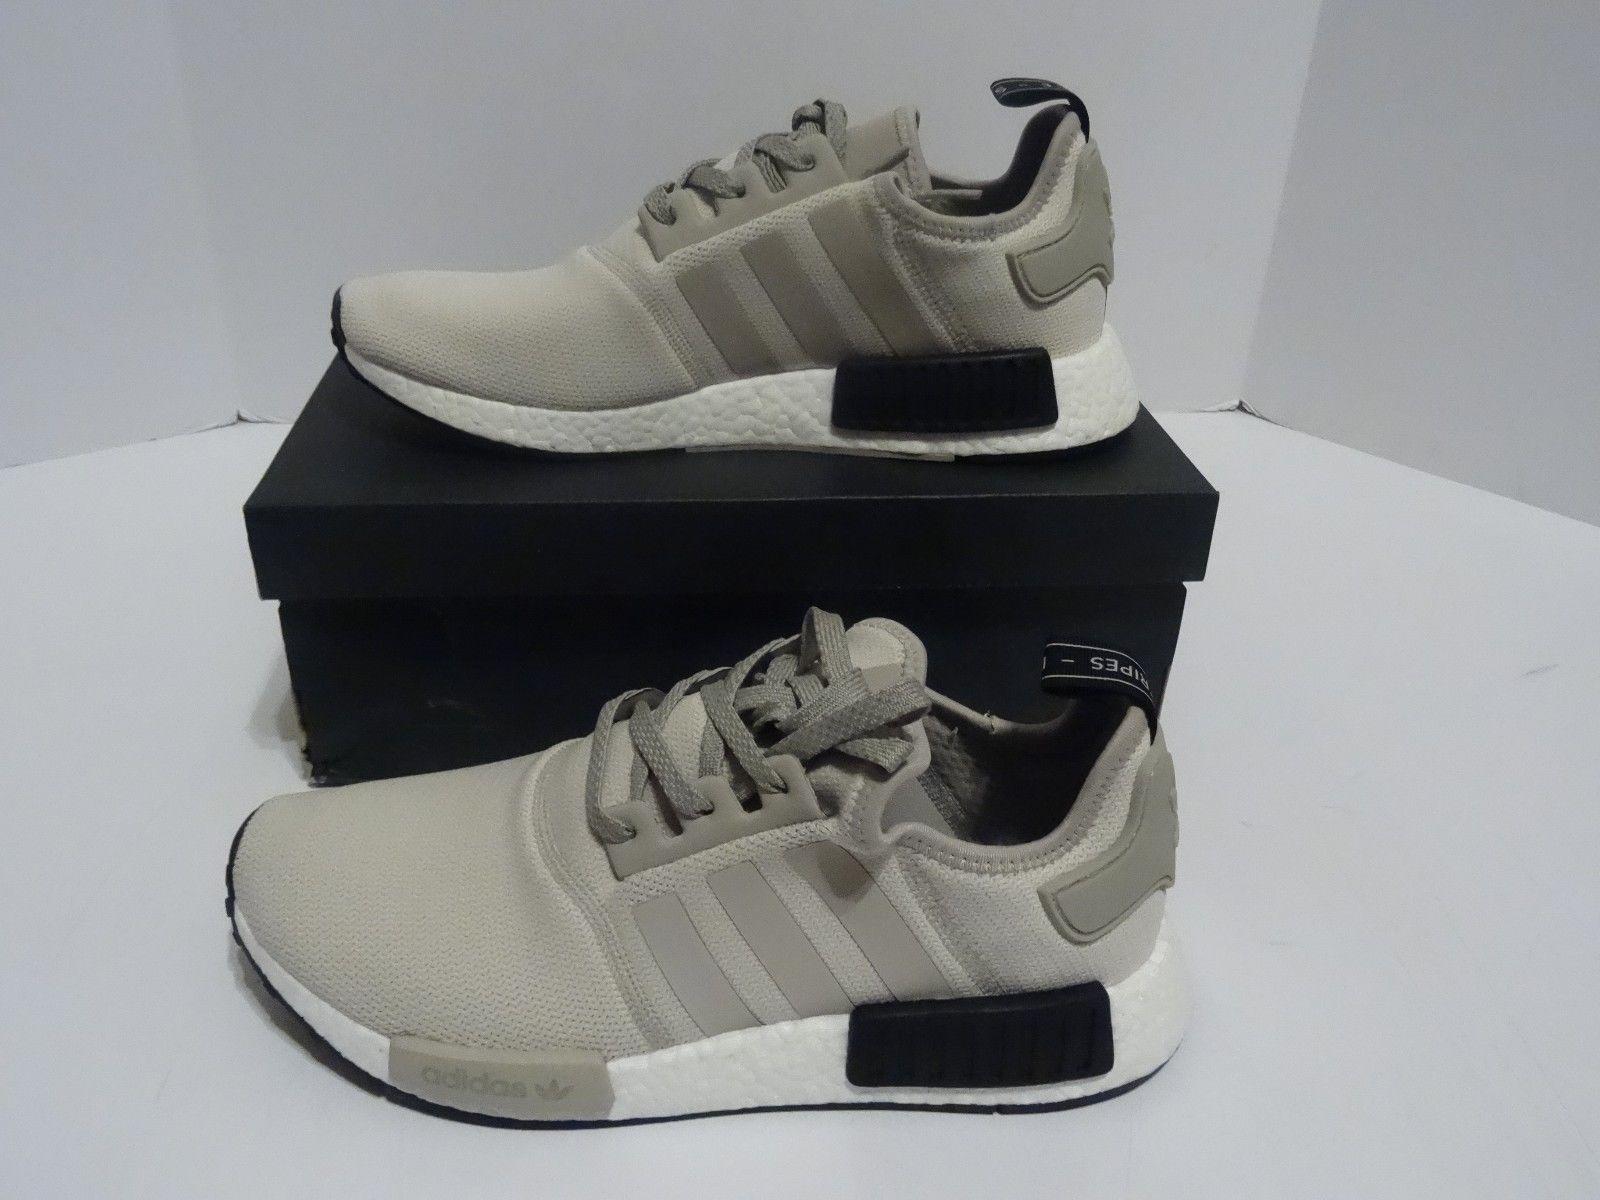 a0a1b69f7 adidas NMD R1 Tan White Cream Black S76848 Men s Sz 10 US NIB ...